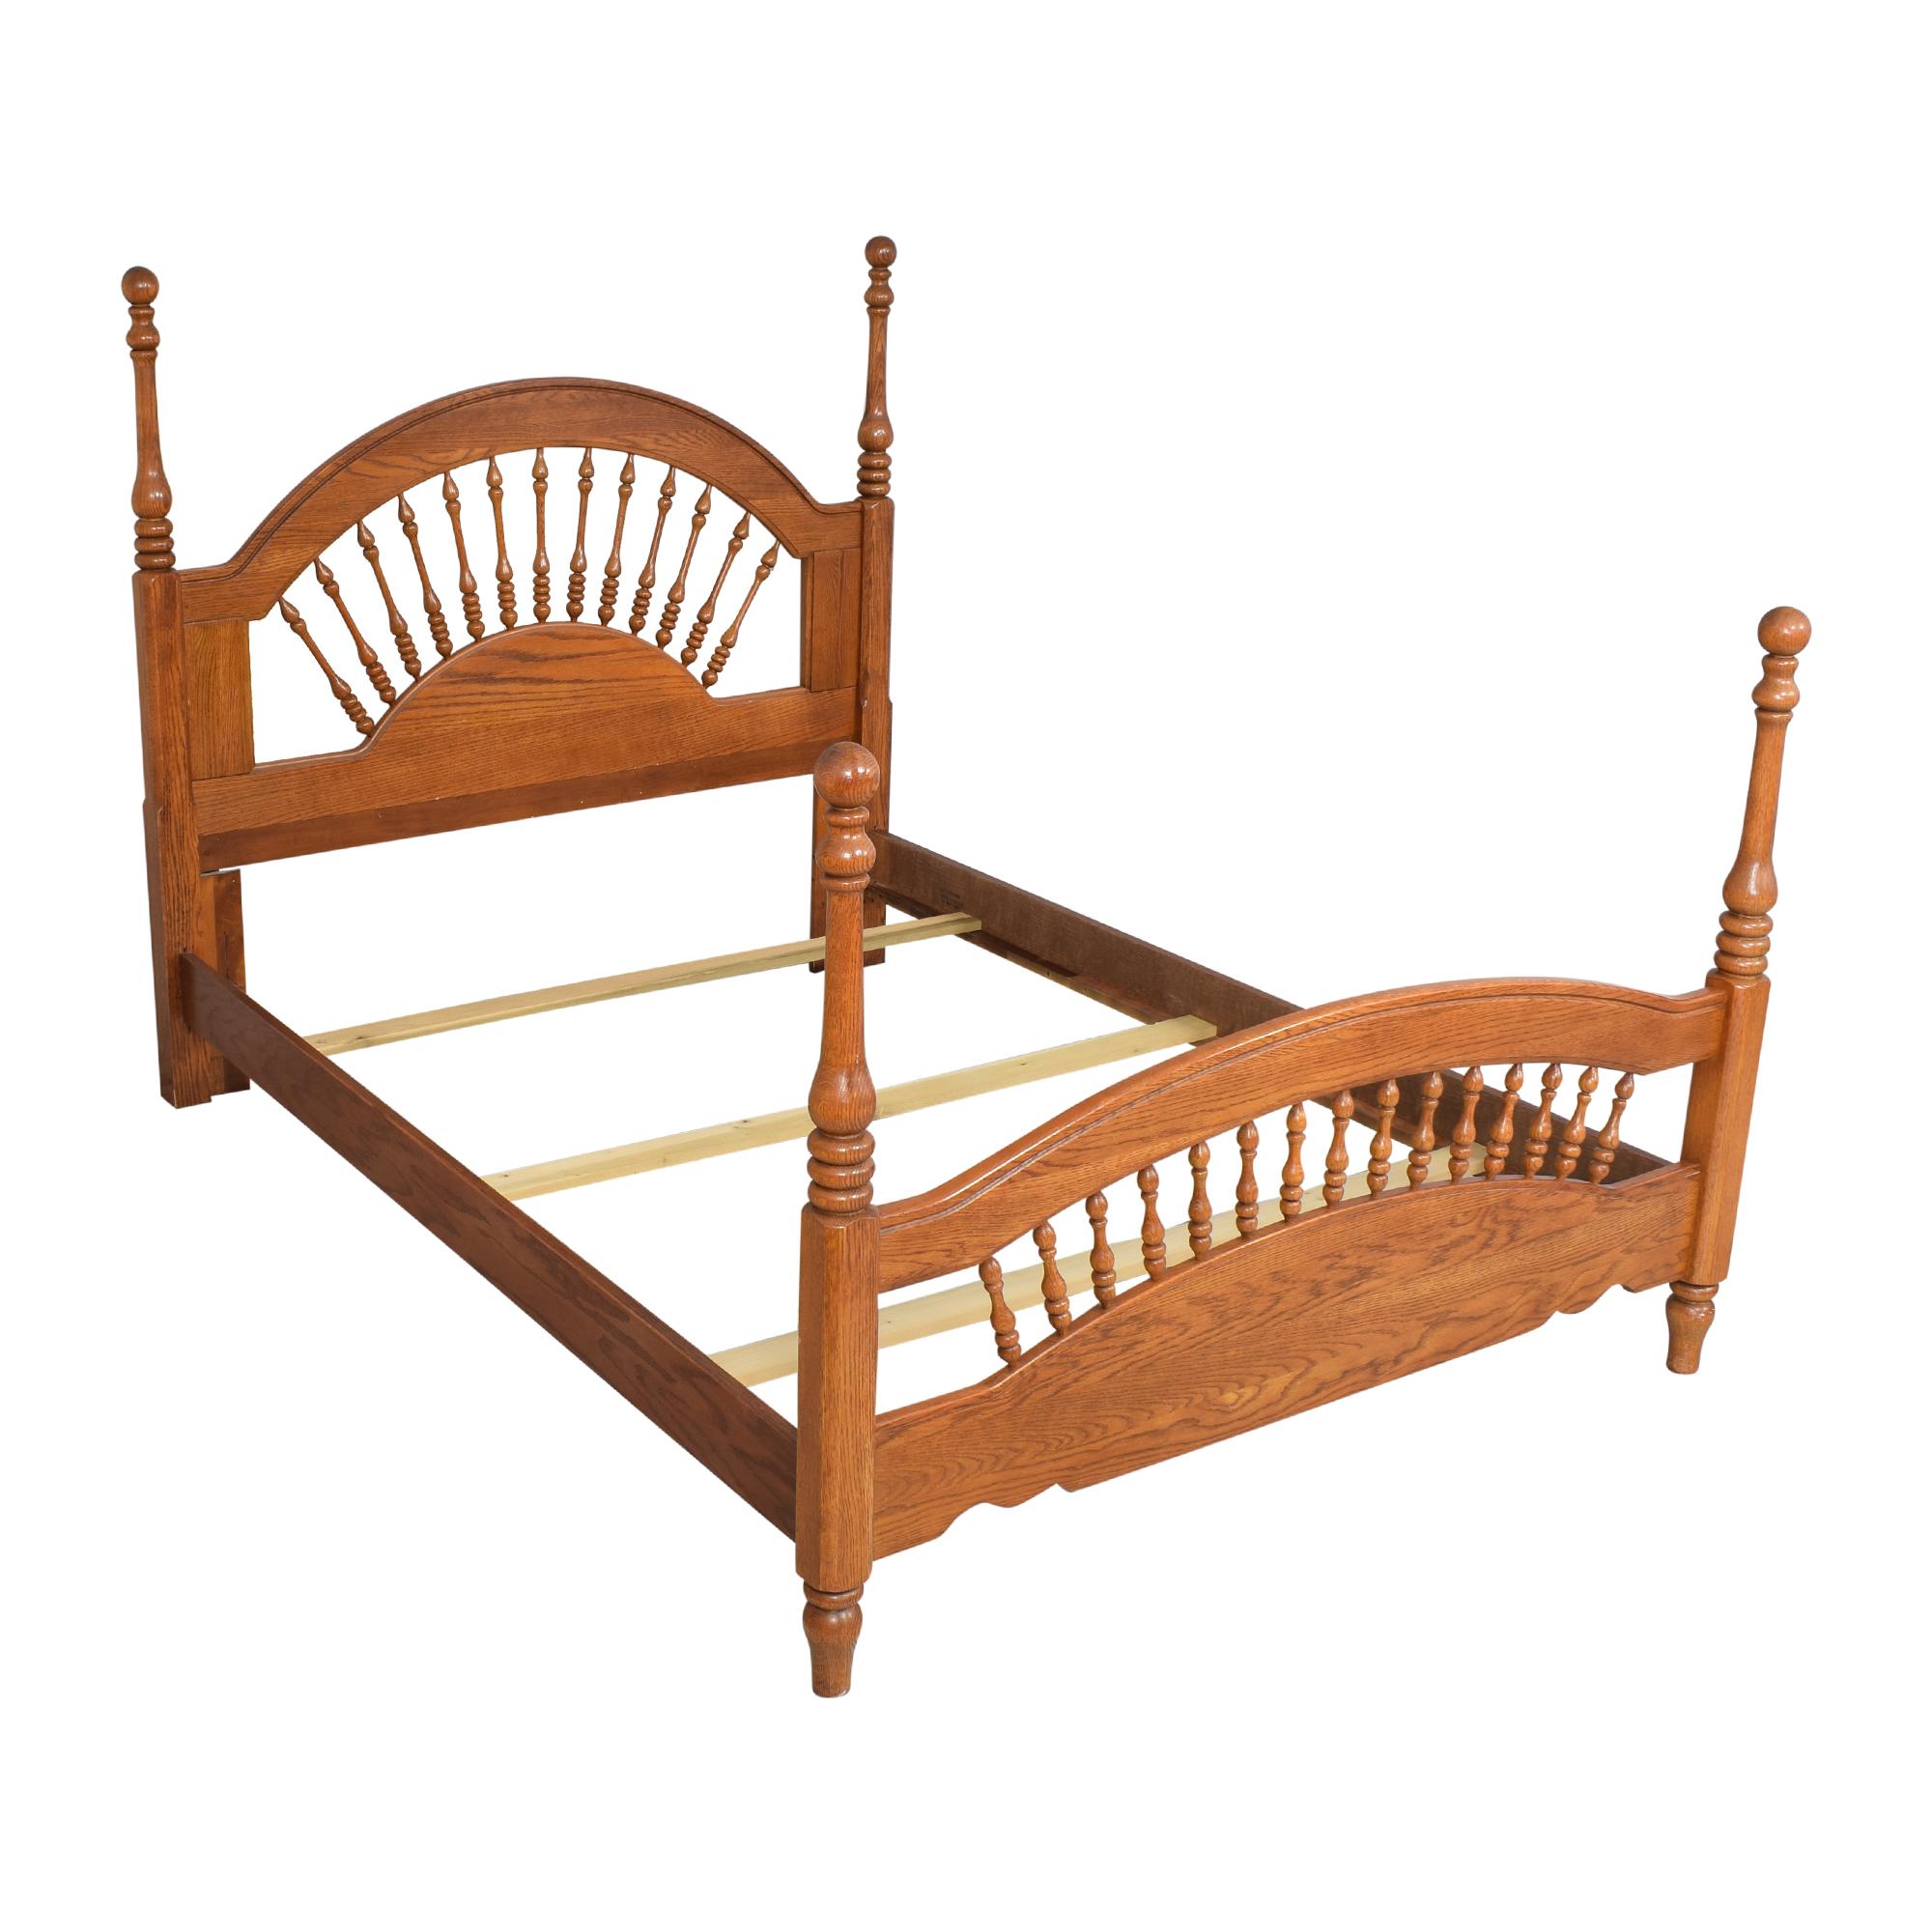 Lexington Furniture Lexington Furniture Spindle Queen Bed Beds